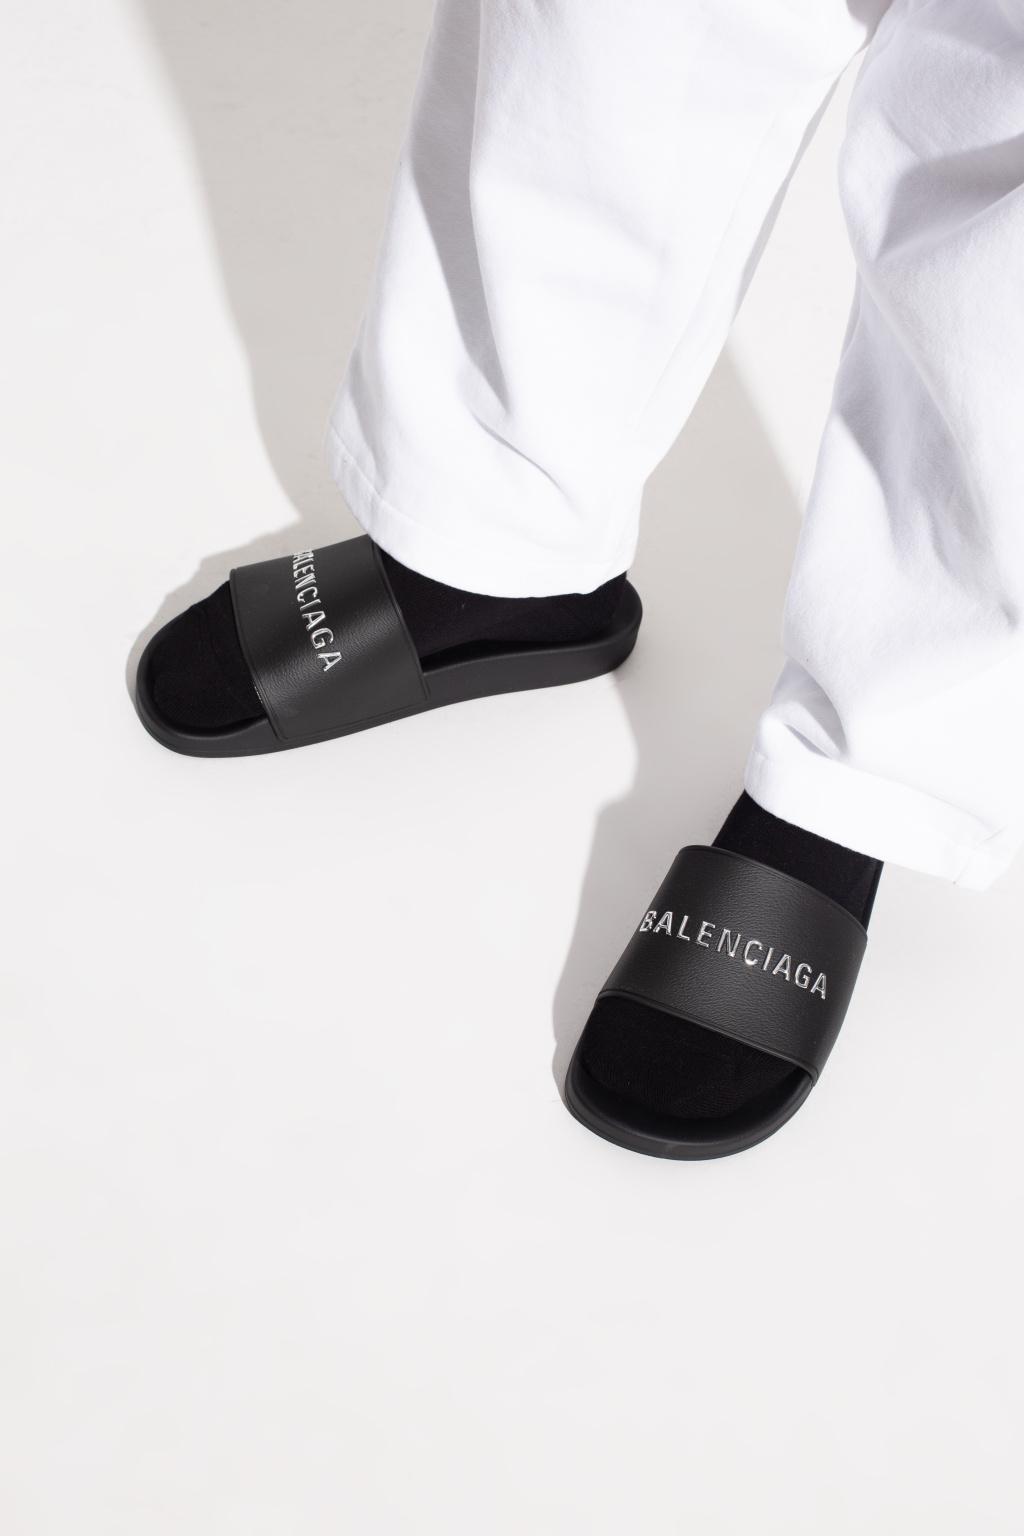 Balenciaga 'Pool' slides with logo